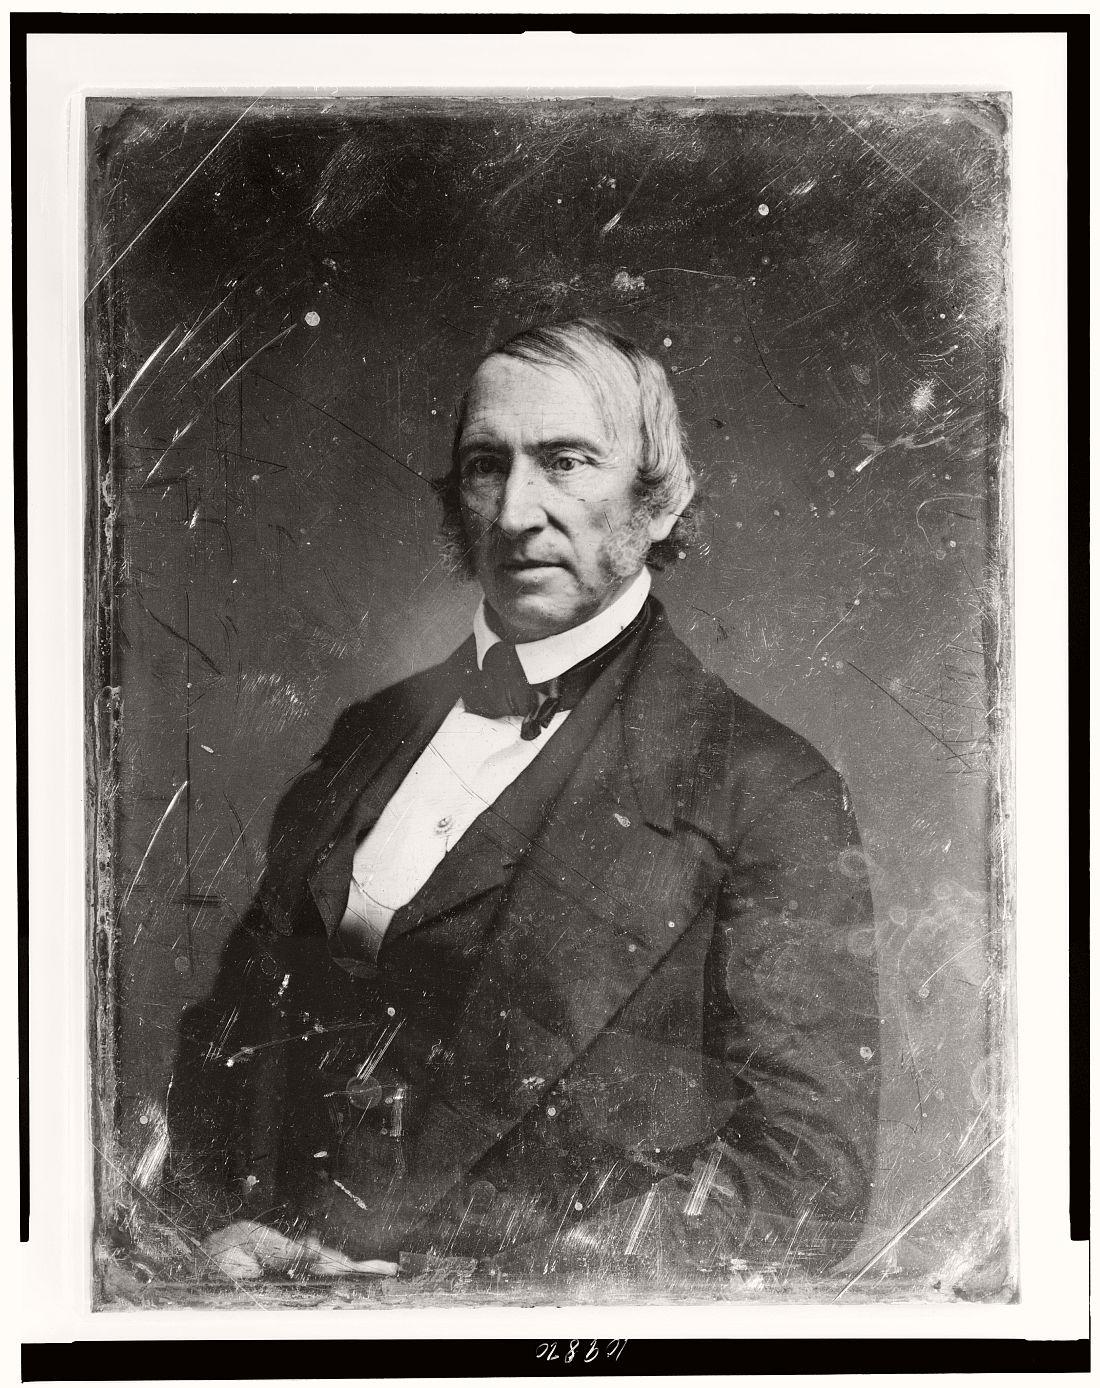 vintage-daguerreotype-portraits-from-xix-century-1844-1860-11